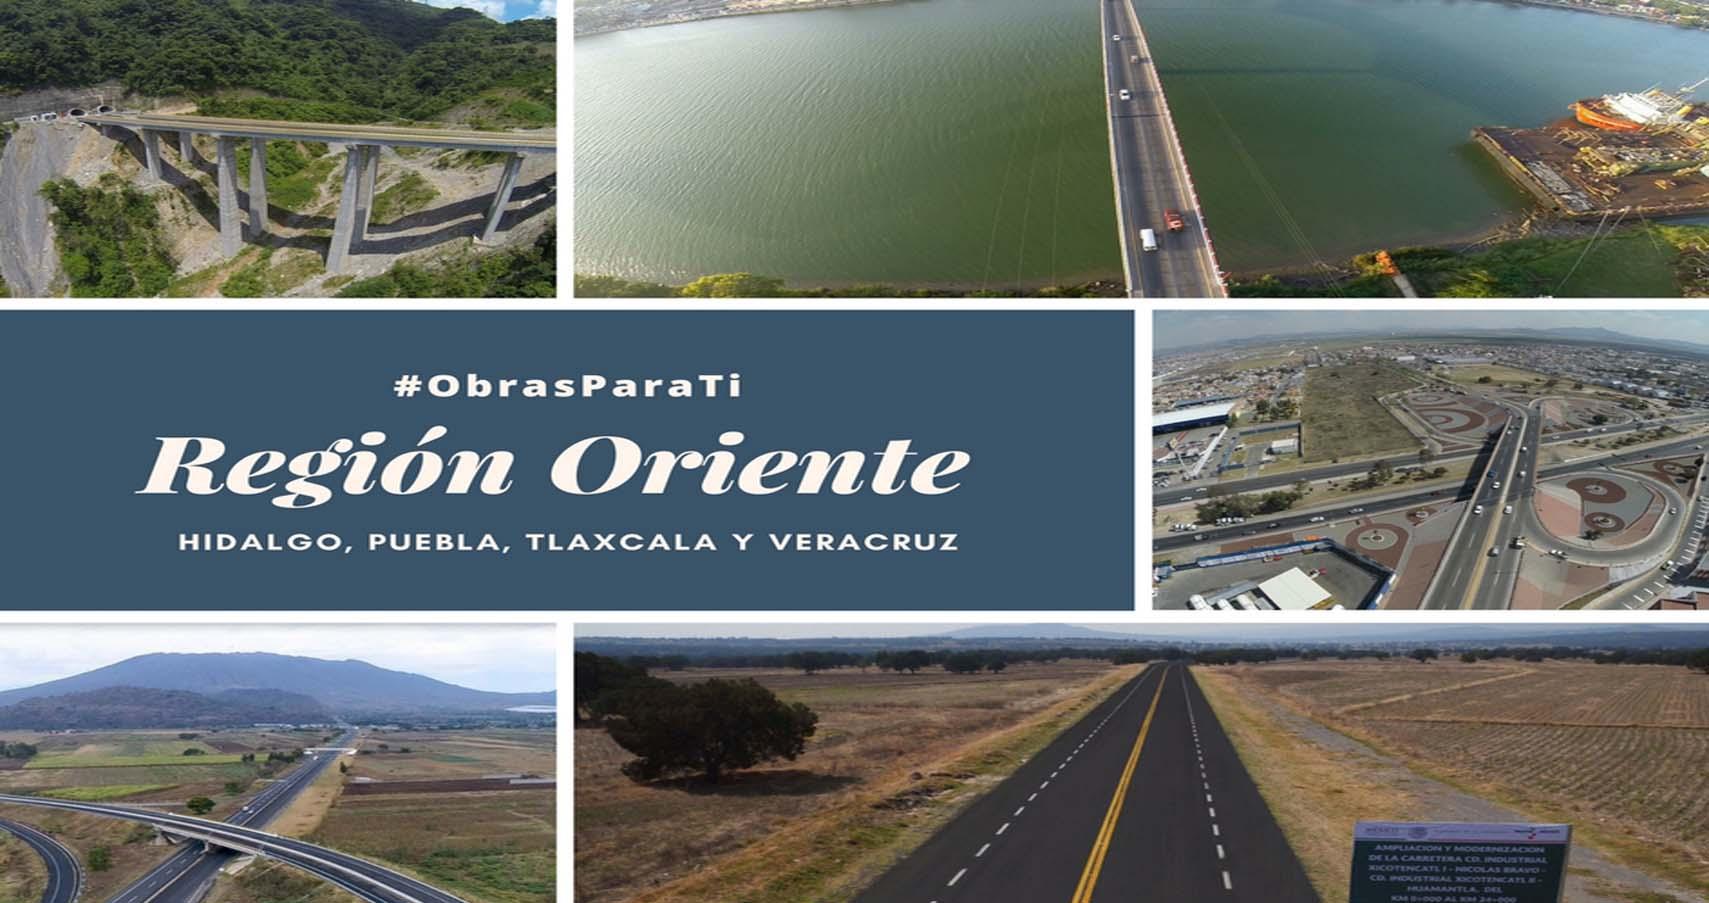 #ObrasParaTi | #RegiónOriente